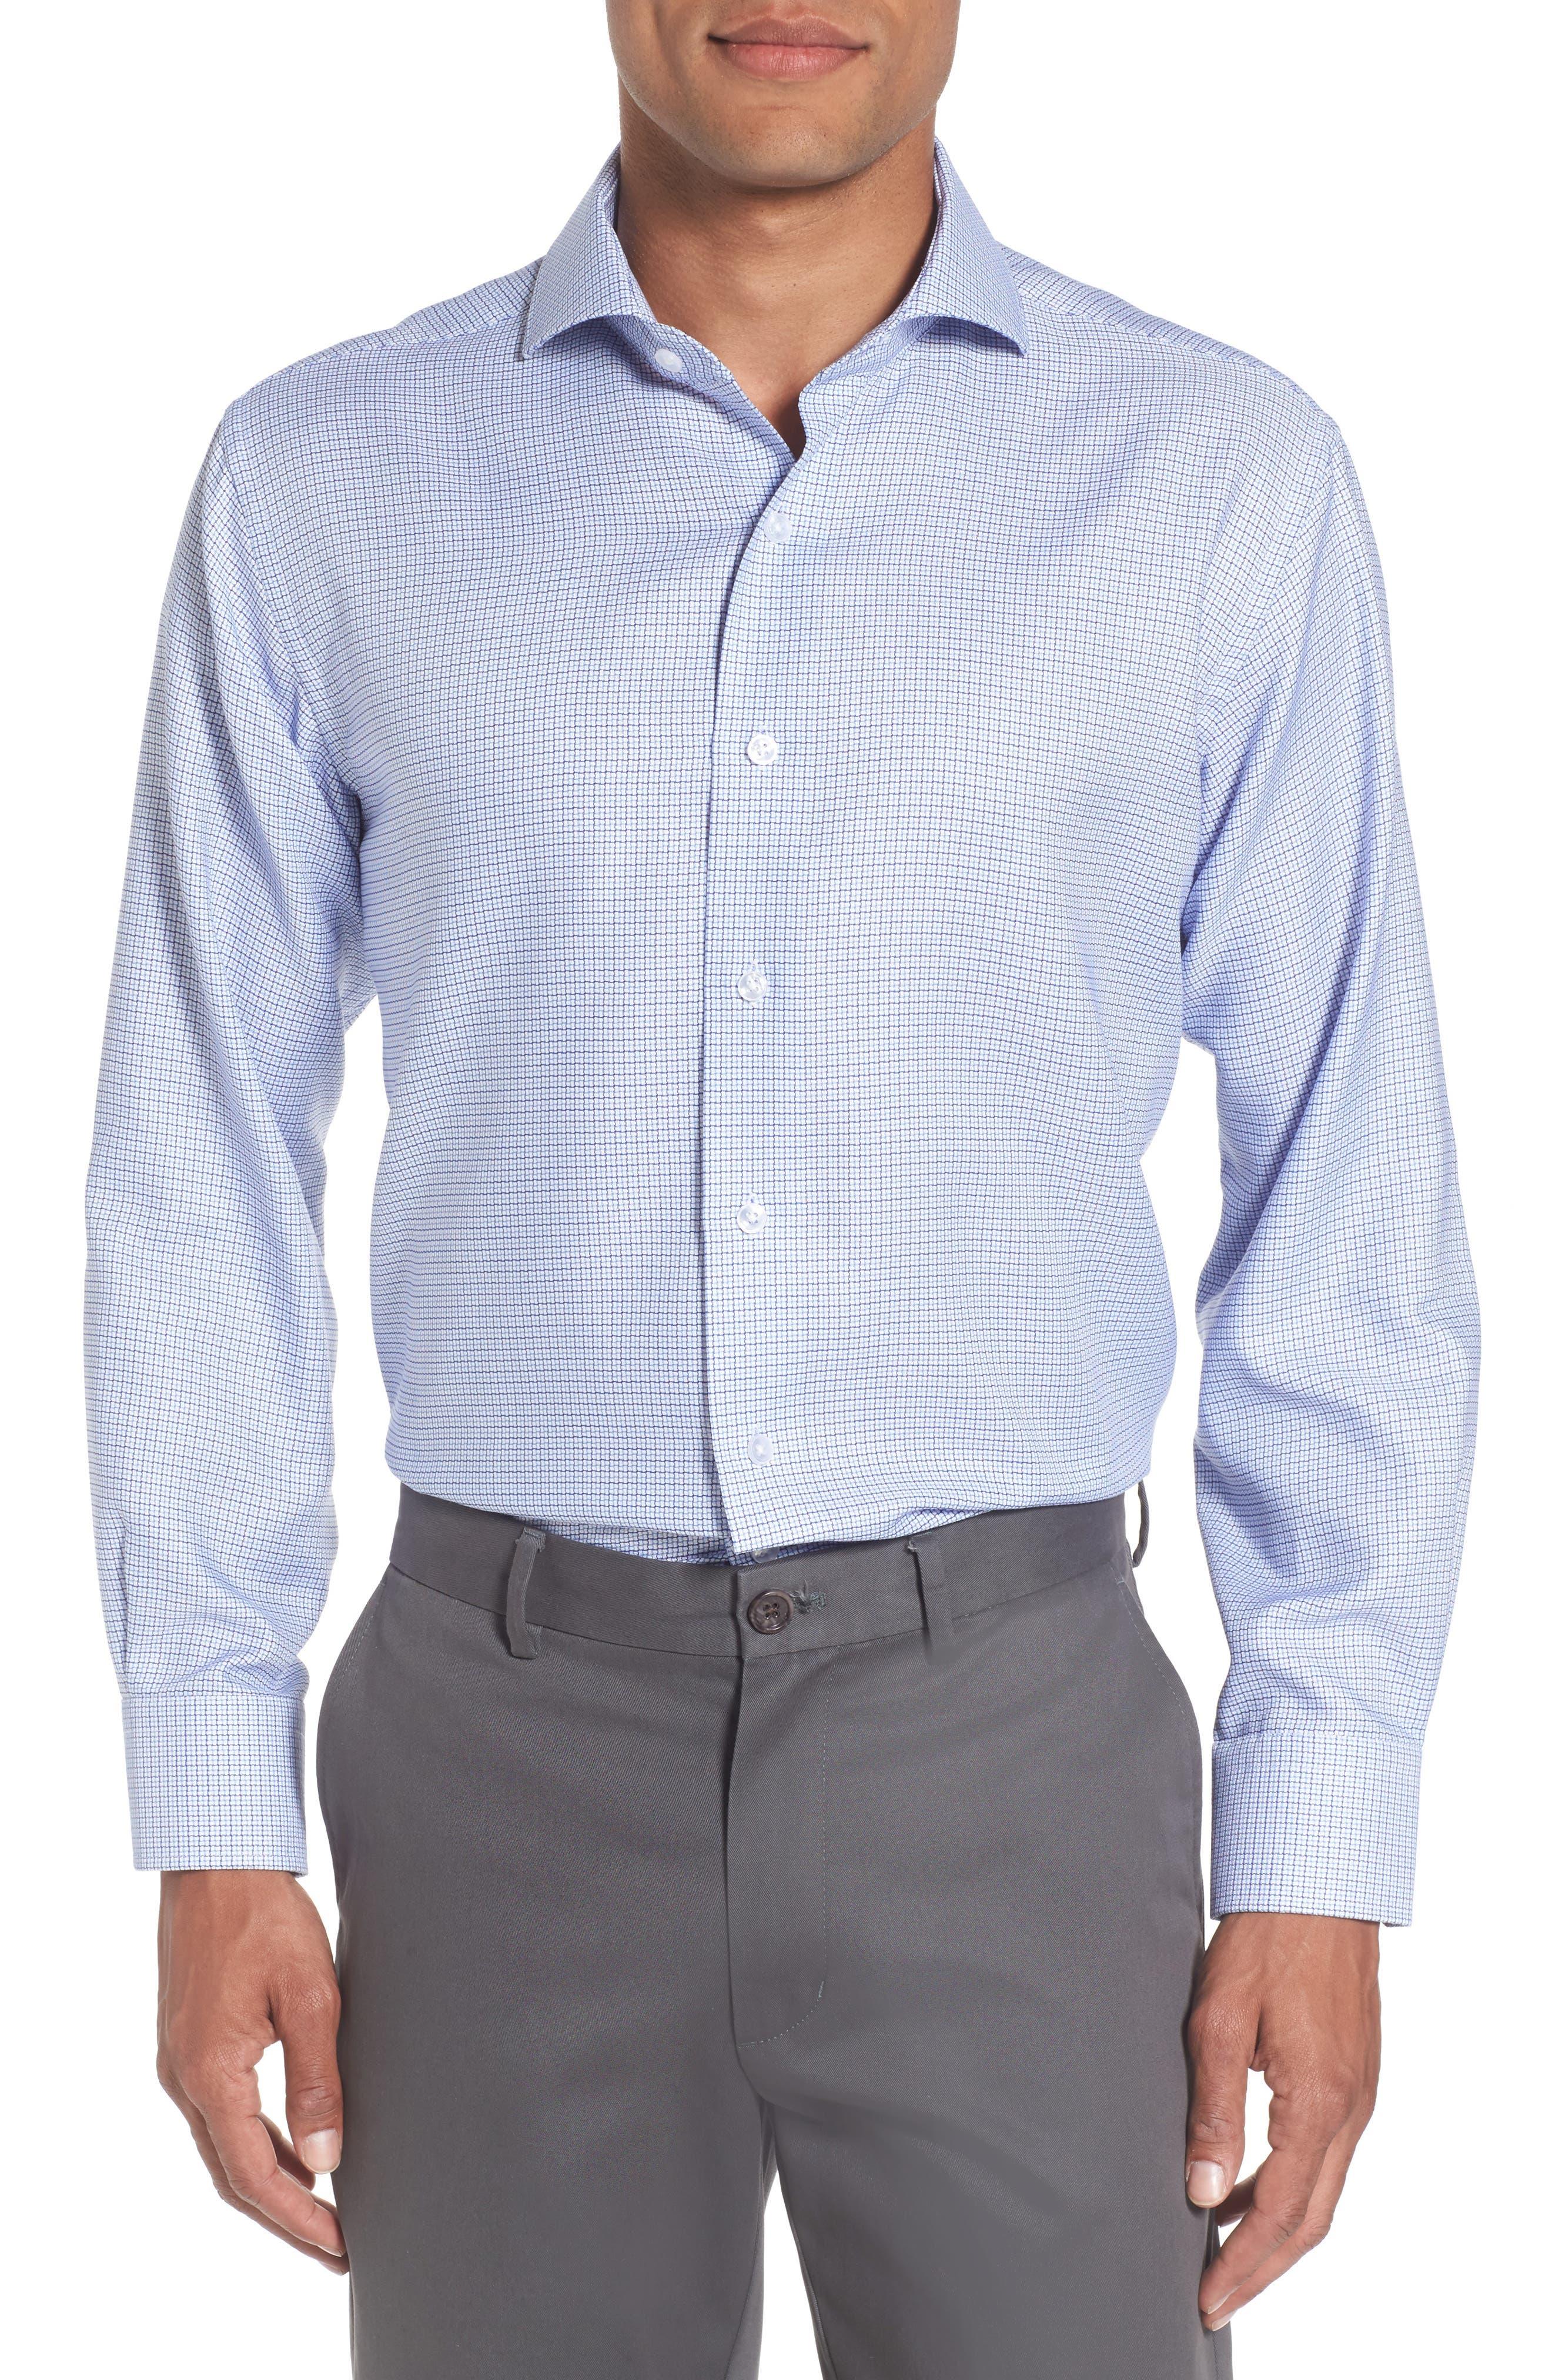 LORENZO UOMO, Trim Fit Check Dress Shirt, Main thumbnail 1, color, LIGHT BLUE/ NAVY